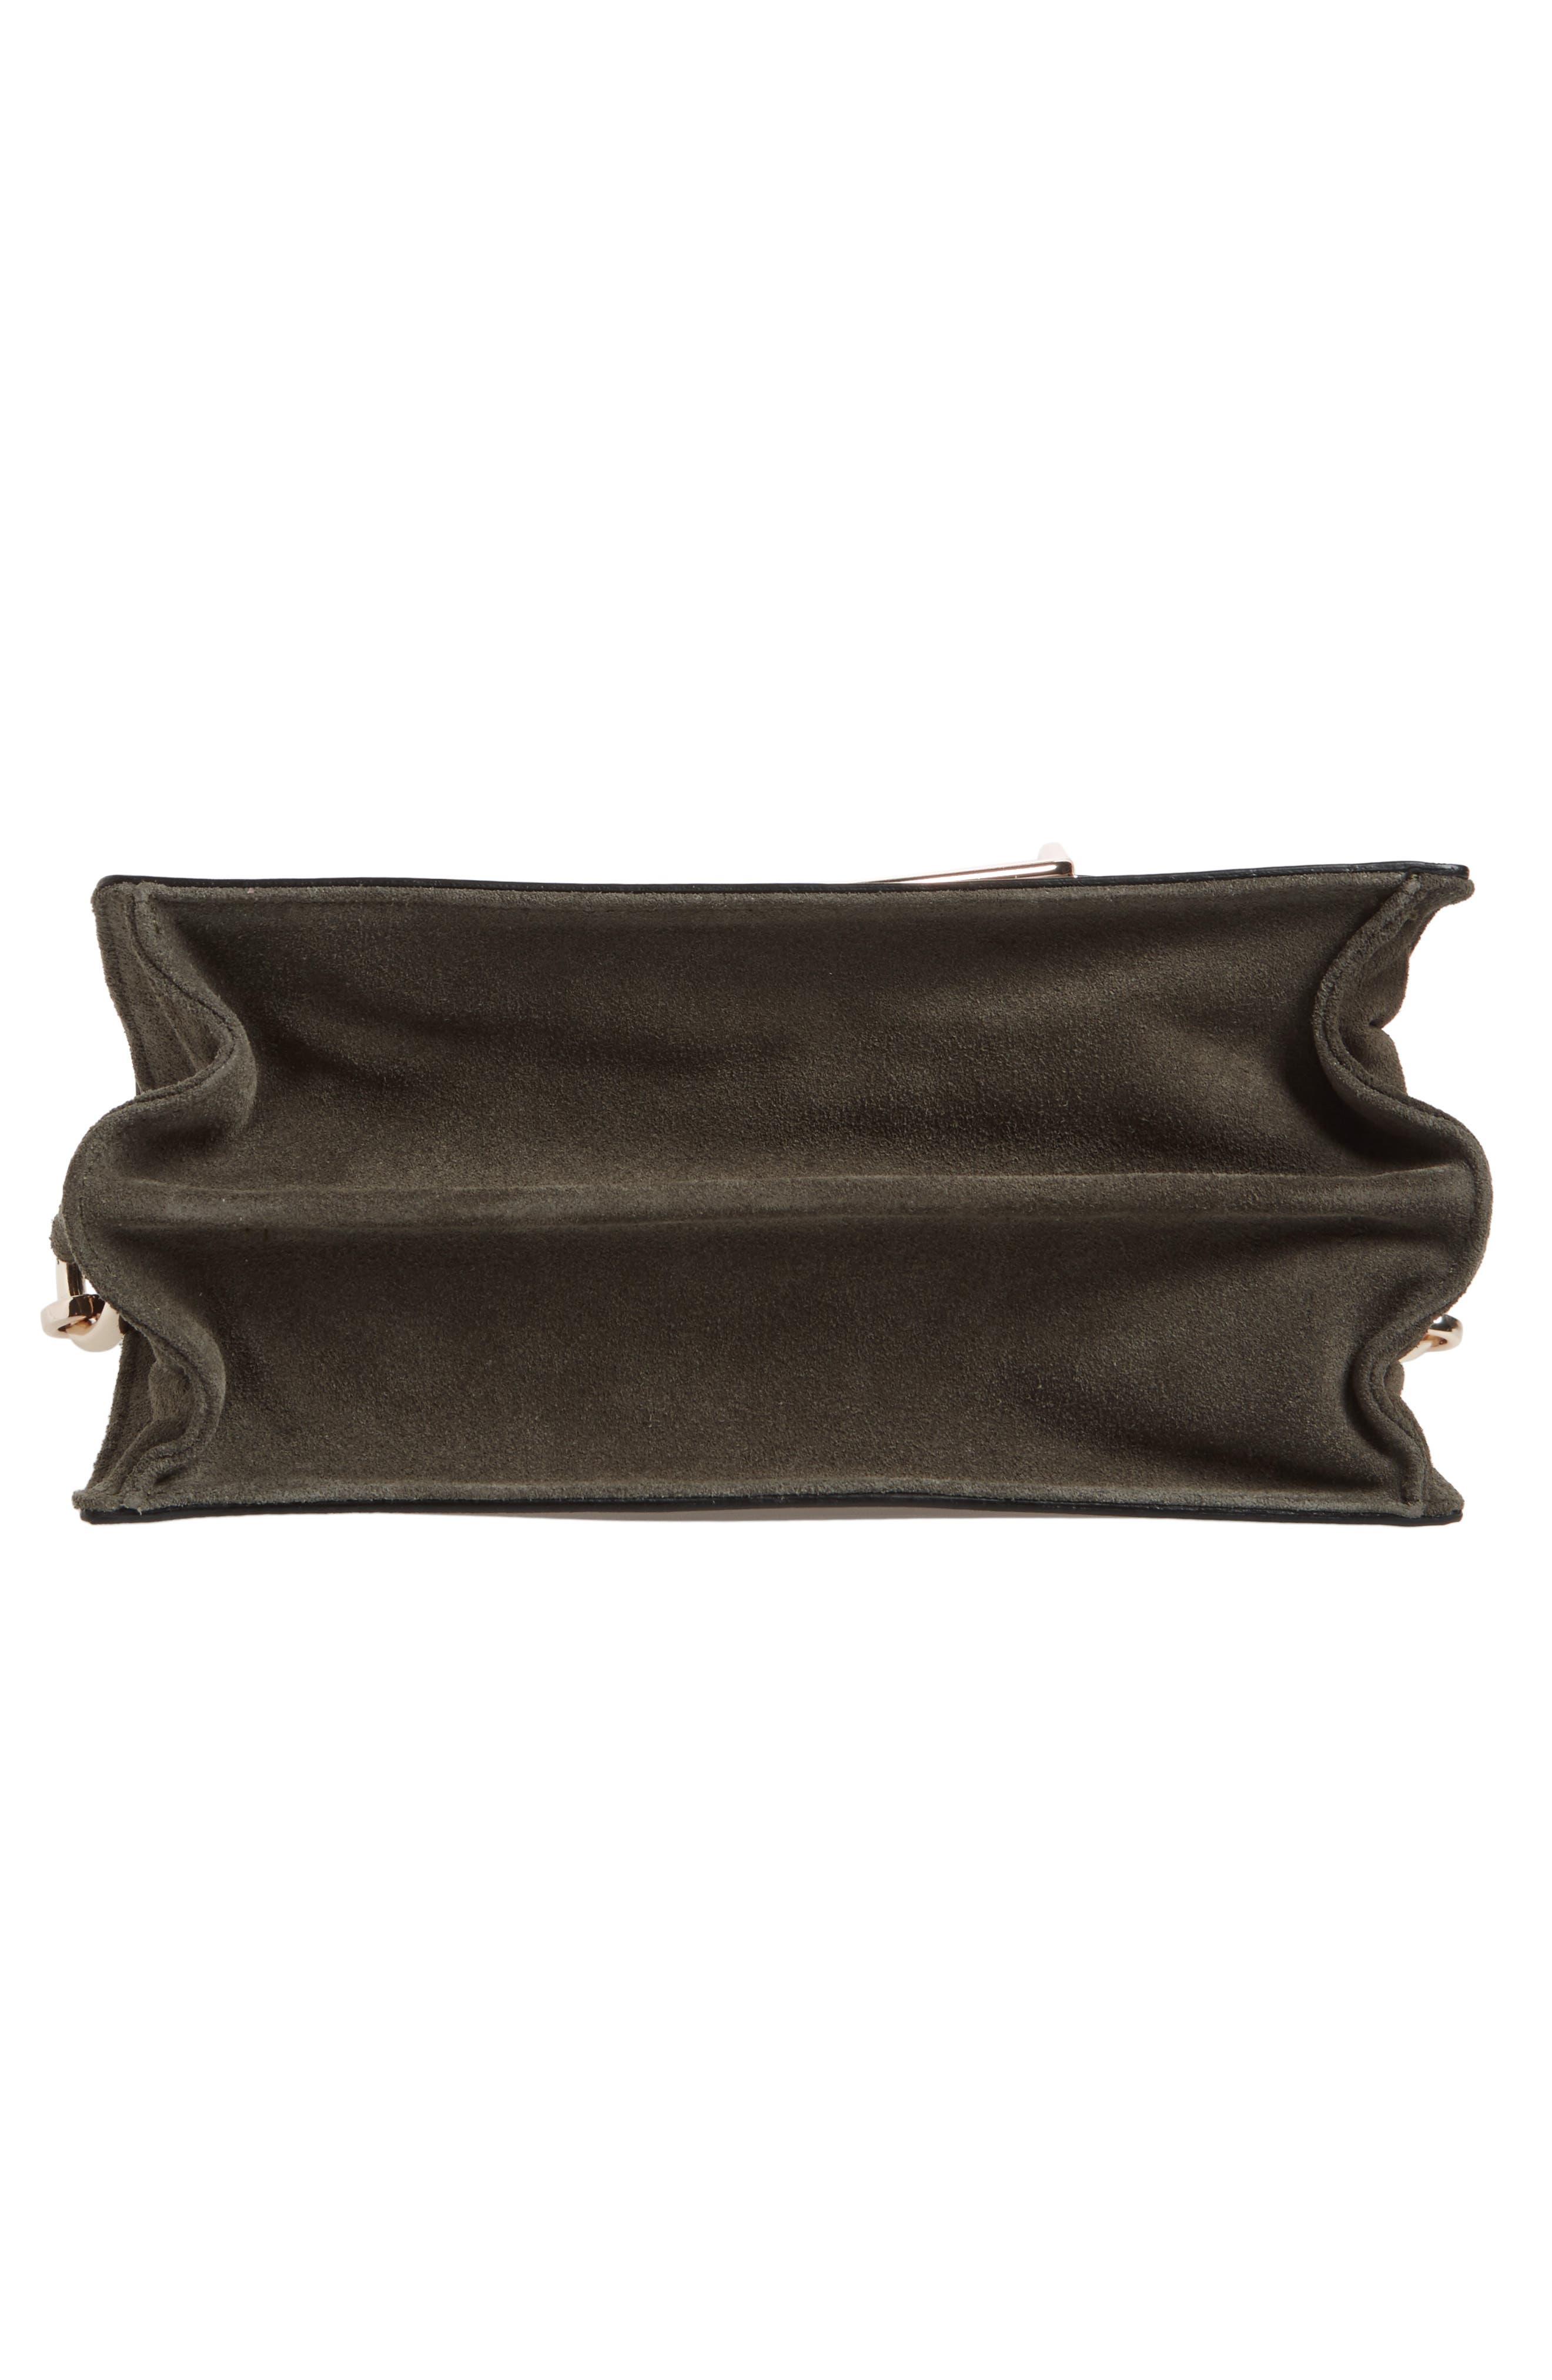 Premium Leather & Suede Soko Shoulder Bag,                             Alternate thumbnail 6, color,